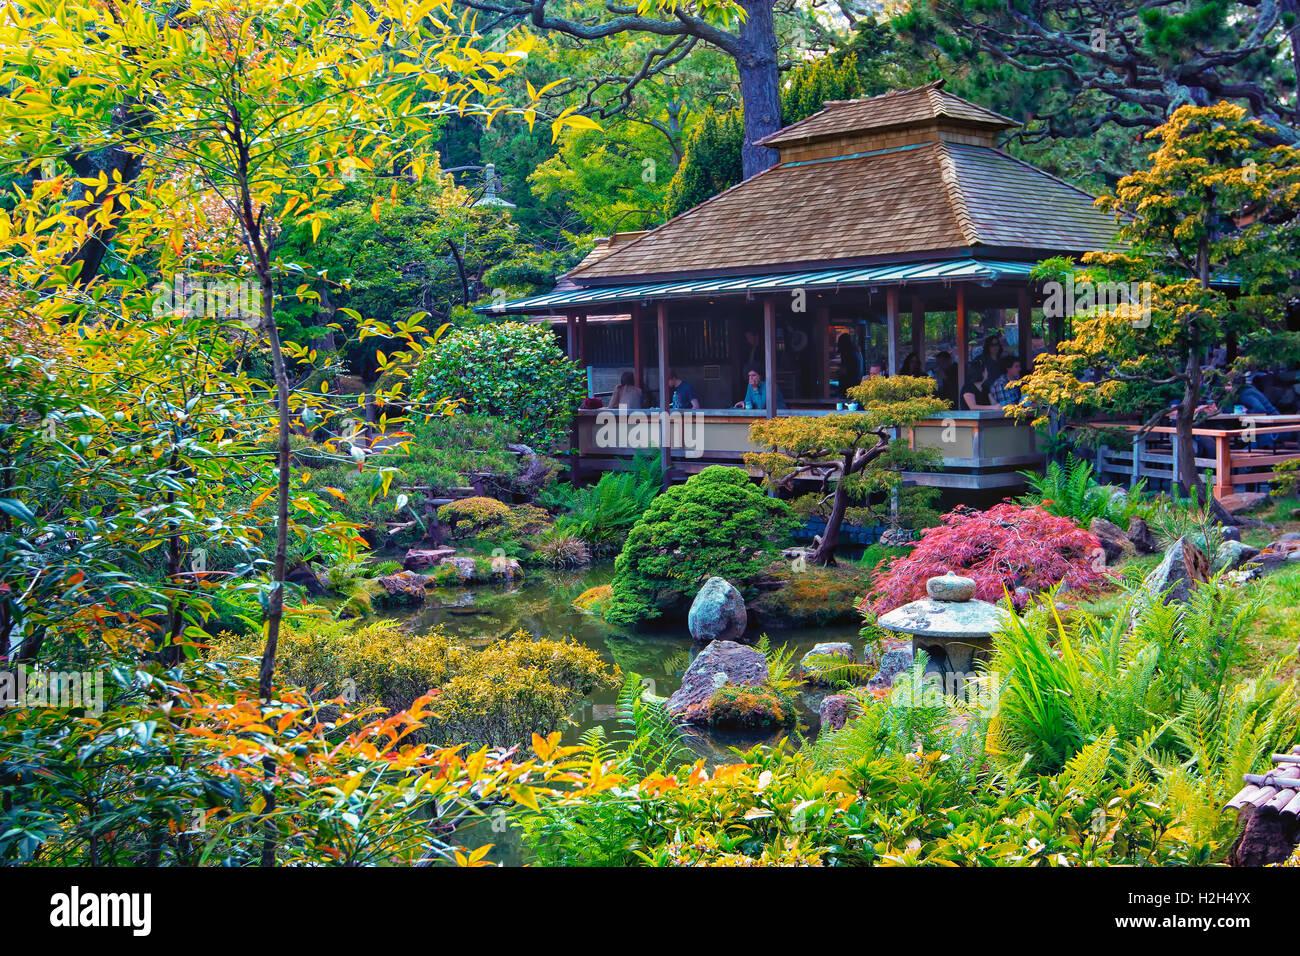 Japanese Garden in Golden Gate Park, San Francisco - Stock Image